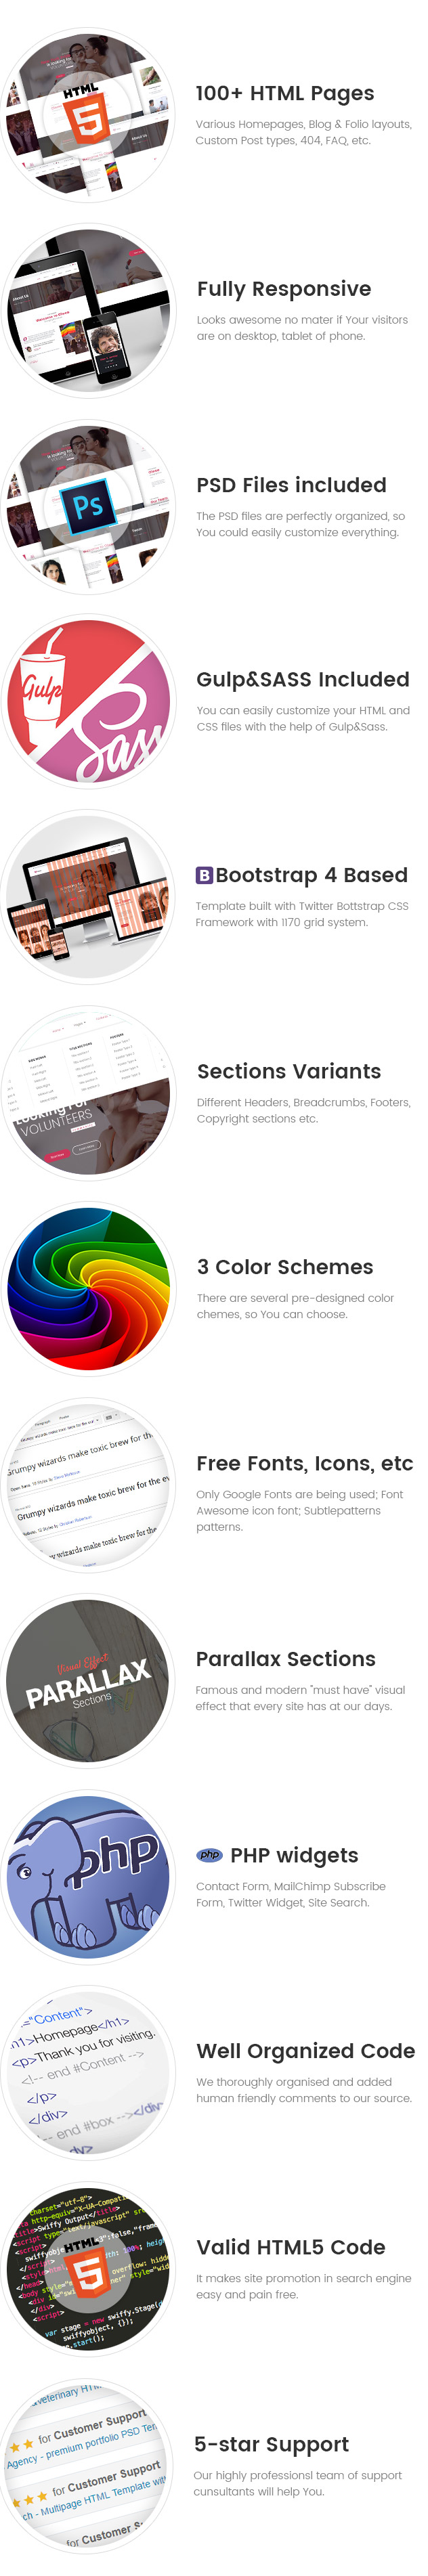 Olwea - LGBT Center HTML Template